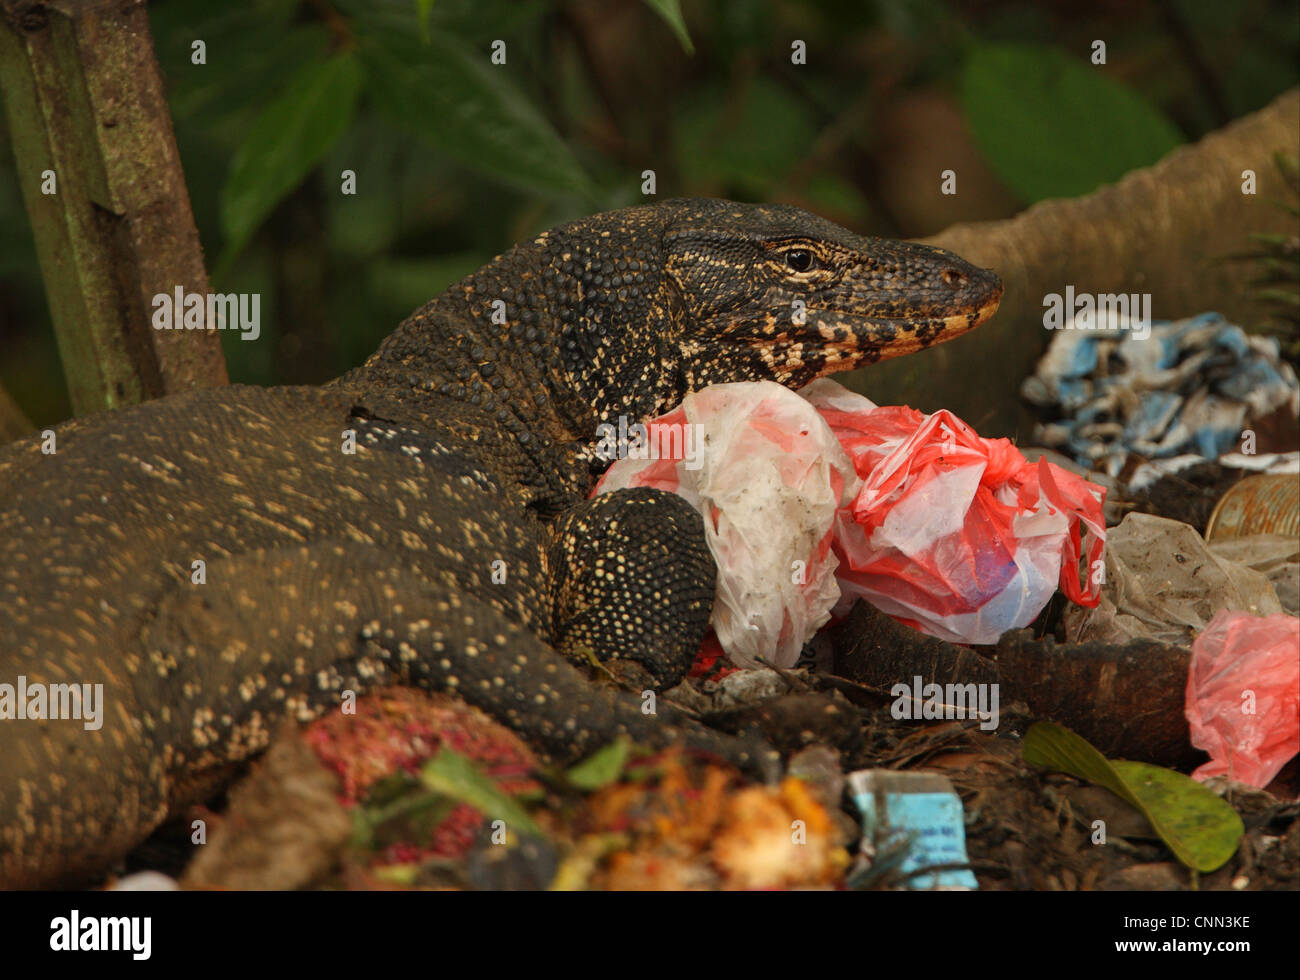 asian water monitor (varanus salvator salvator) 'kabaragoya', adult